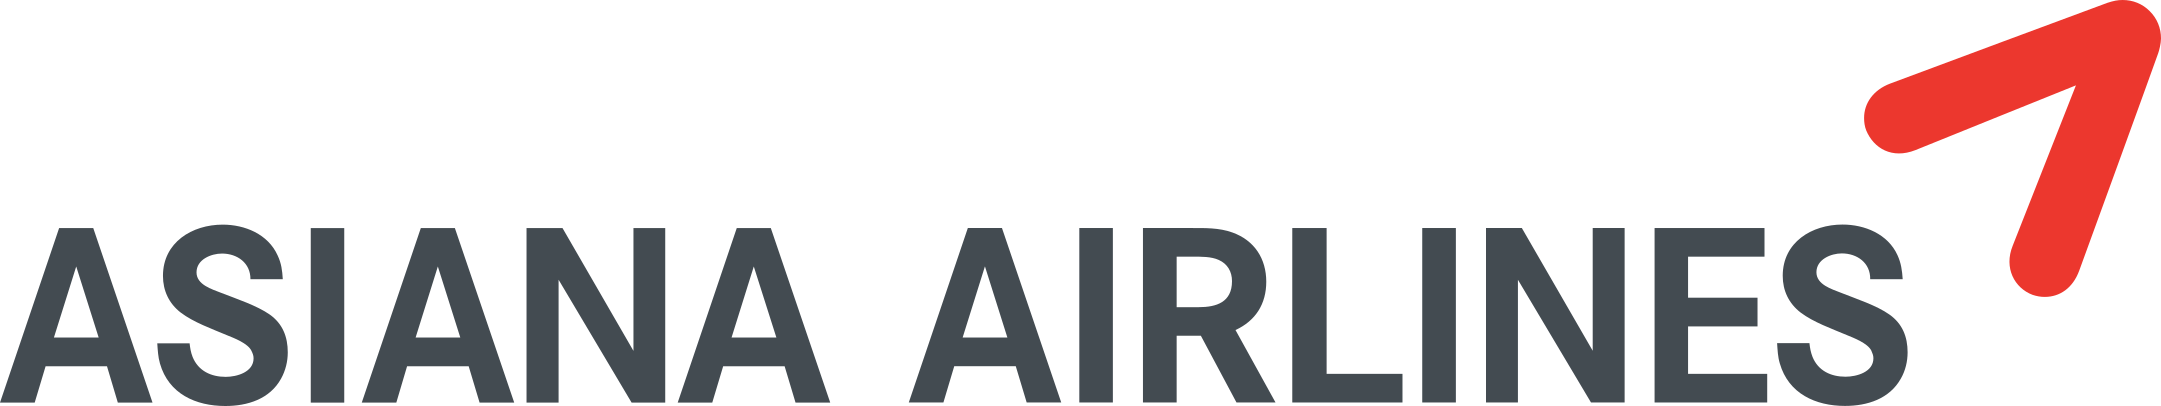 asiana airlines logo 1 - Asiana Airlines Logo